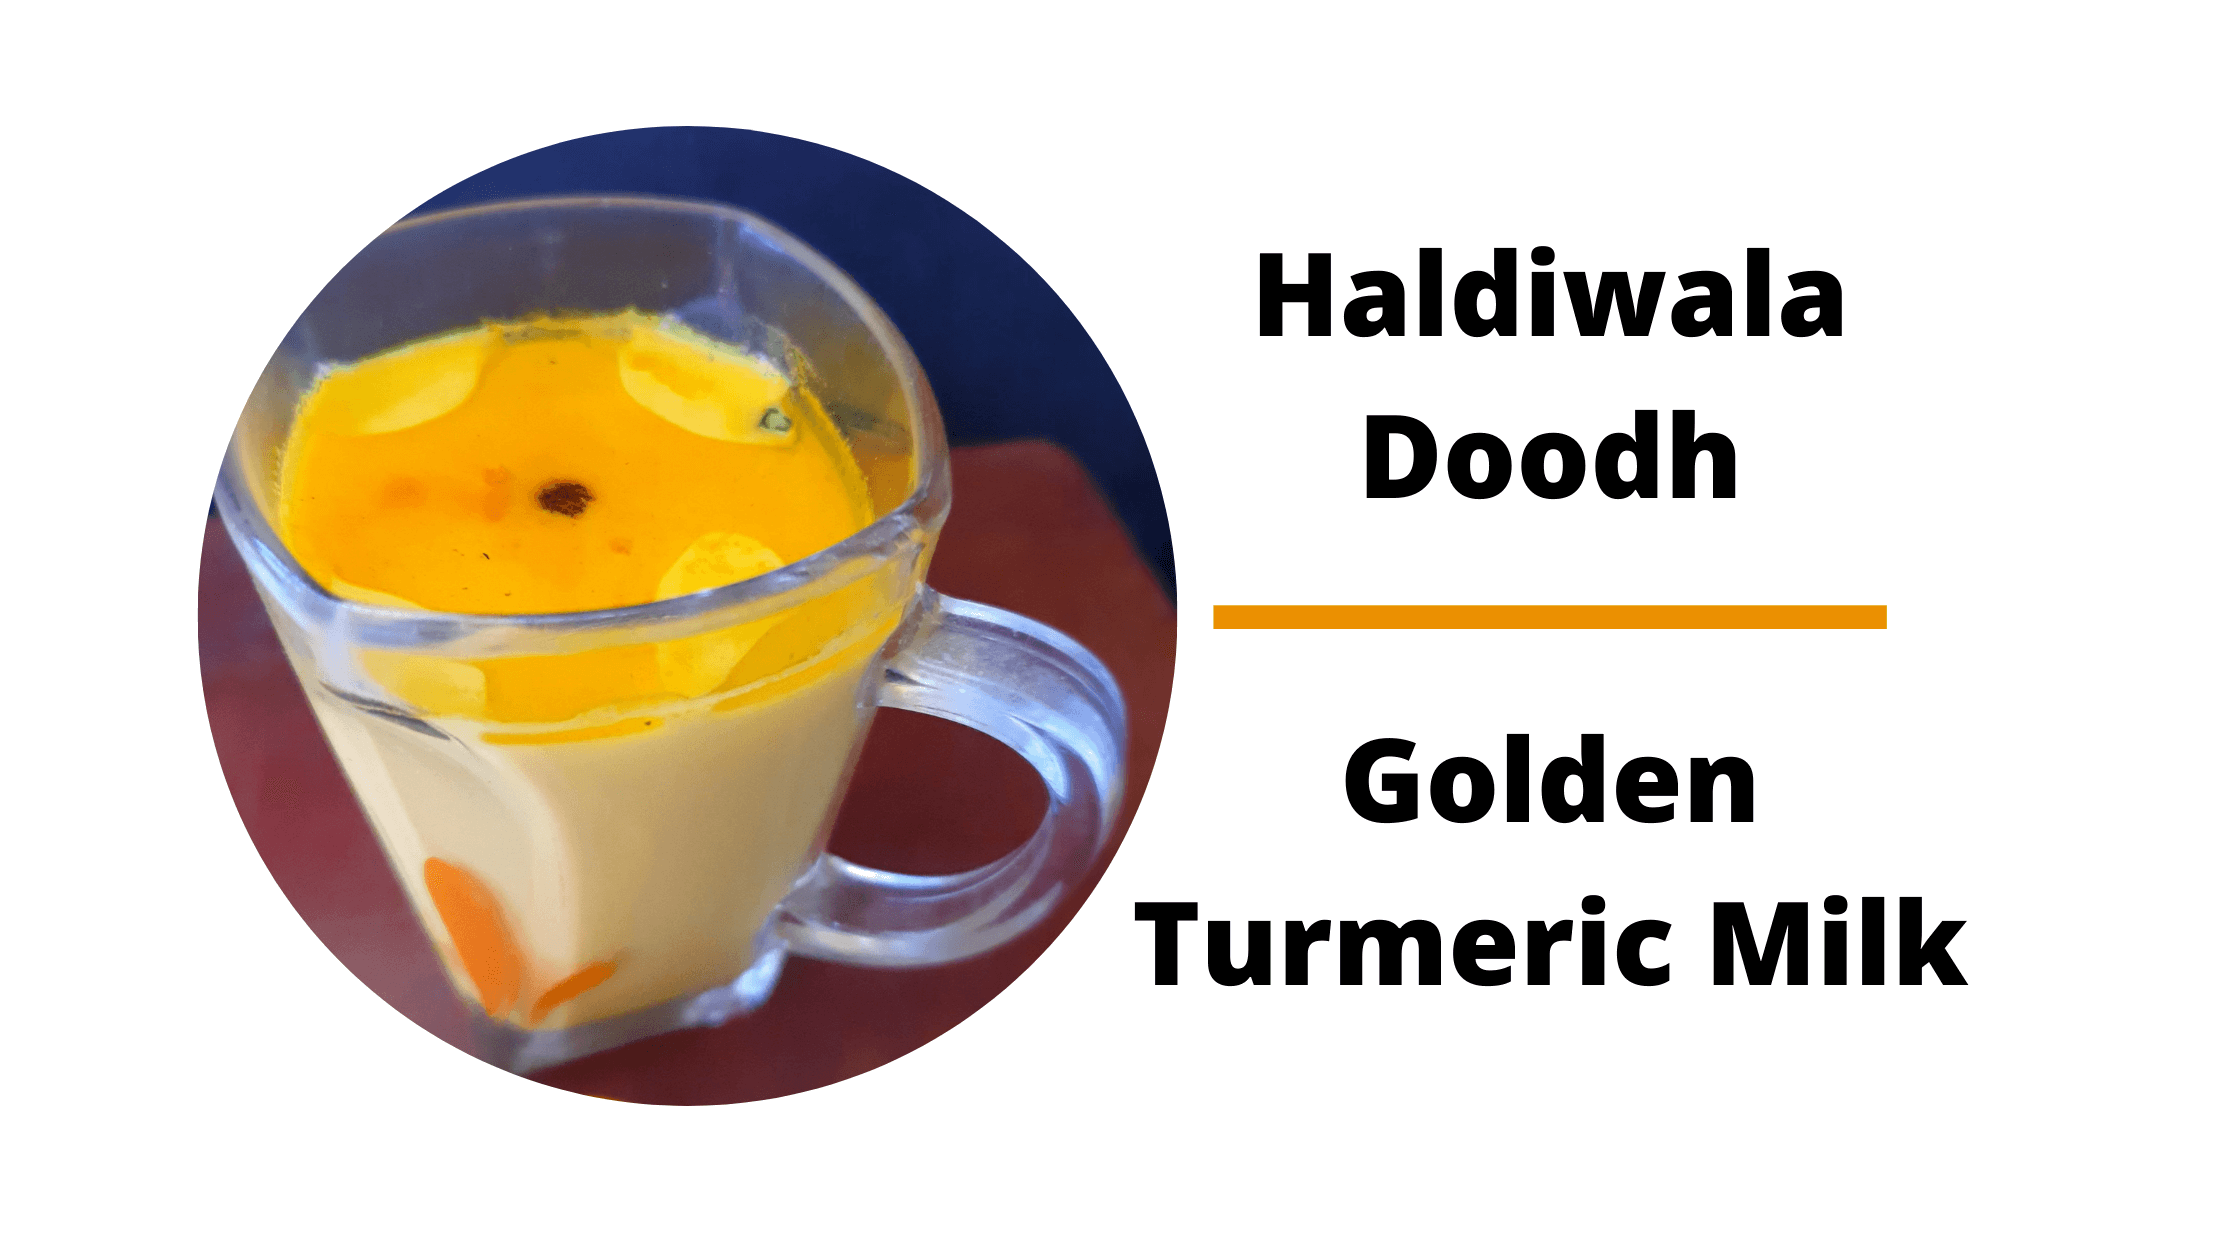 Haldiwala Doodh (1)